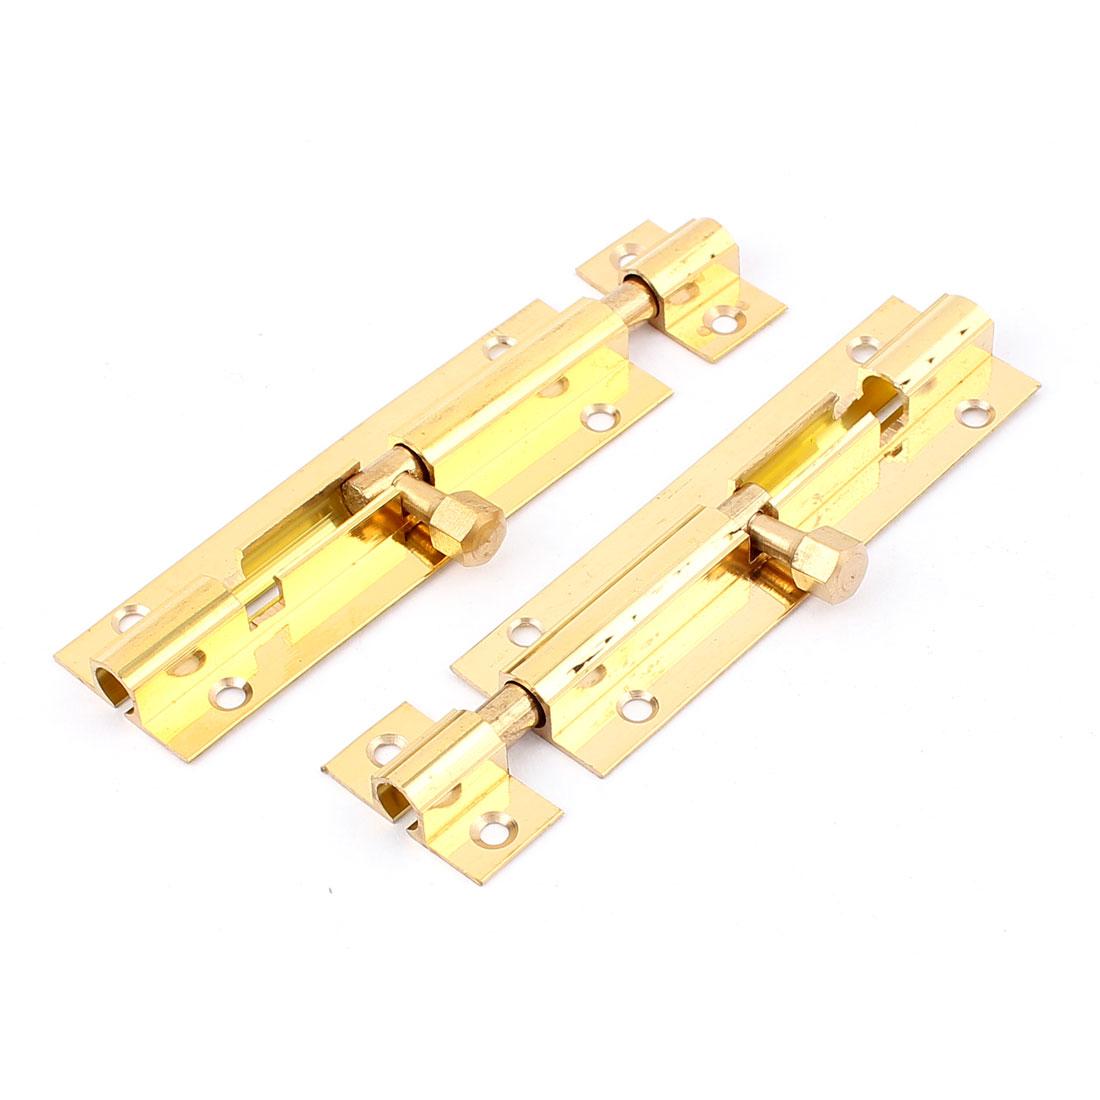 "Cabinet Door Lock Latch Slide Barrel Bolt Clasp 3"" Brass Tone"